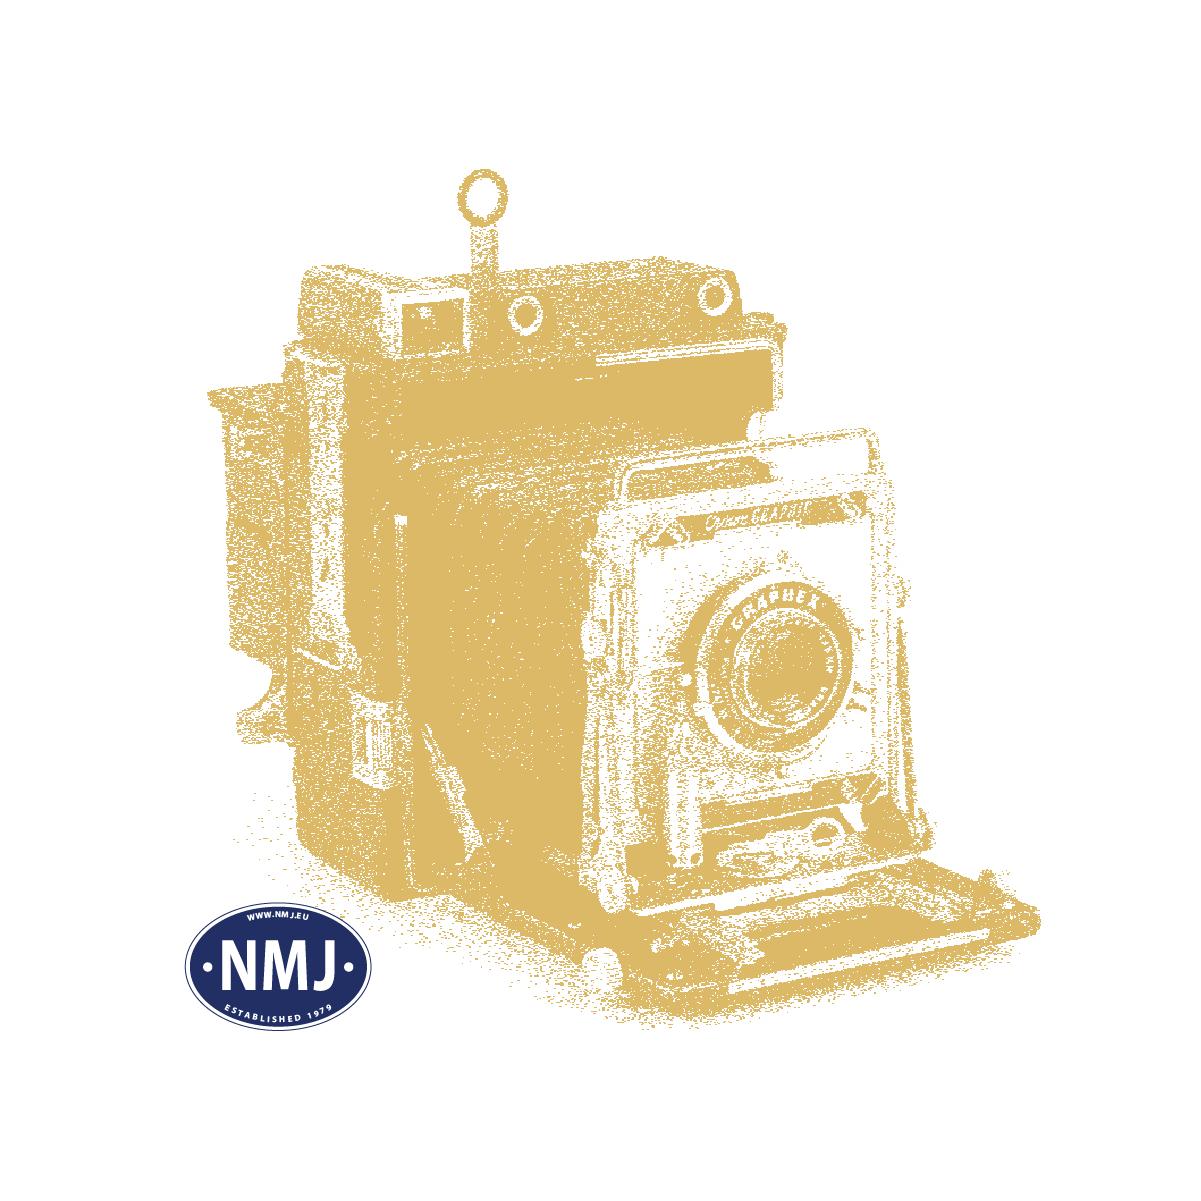 NMJE501417 - NMJ Exclusiv Modell WLABm UIC Y der SZD Schlafwagen Oslo-Moskau